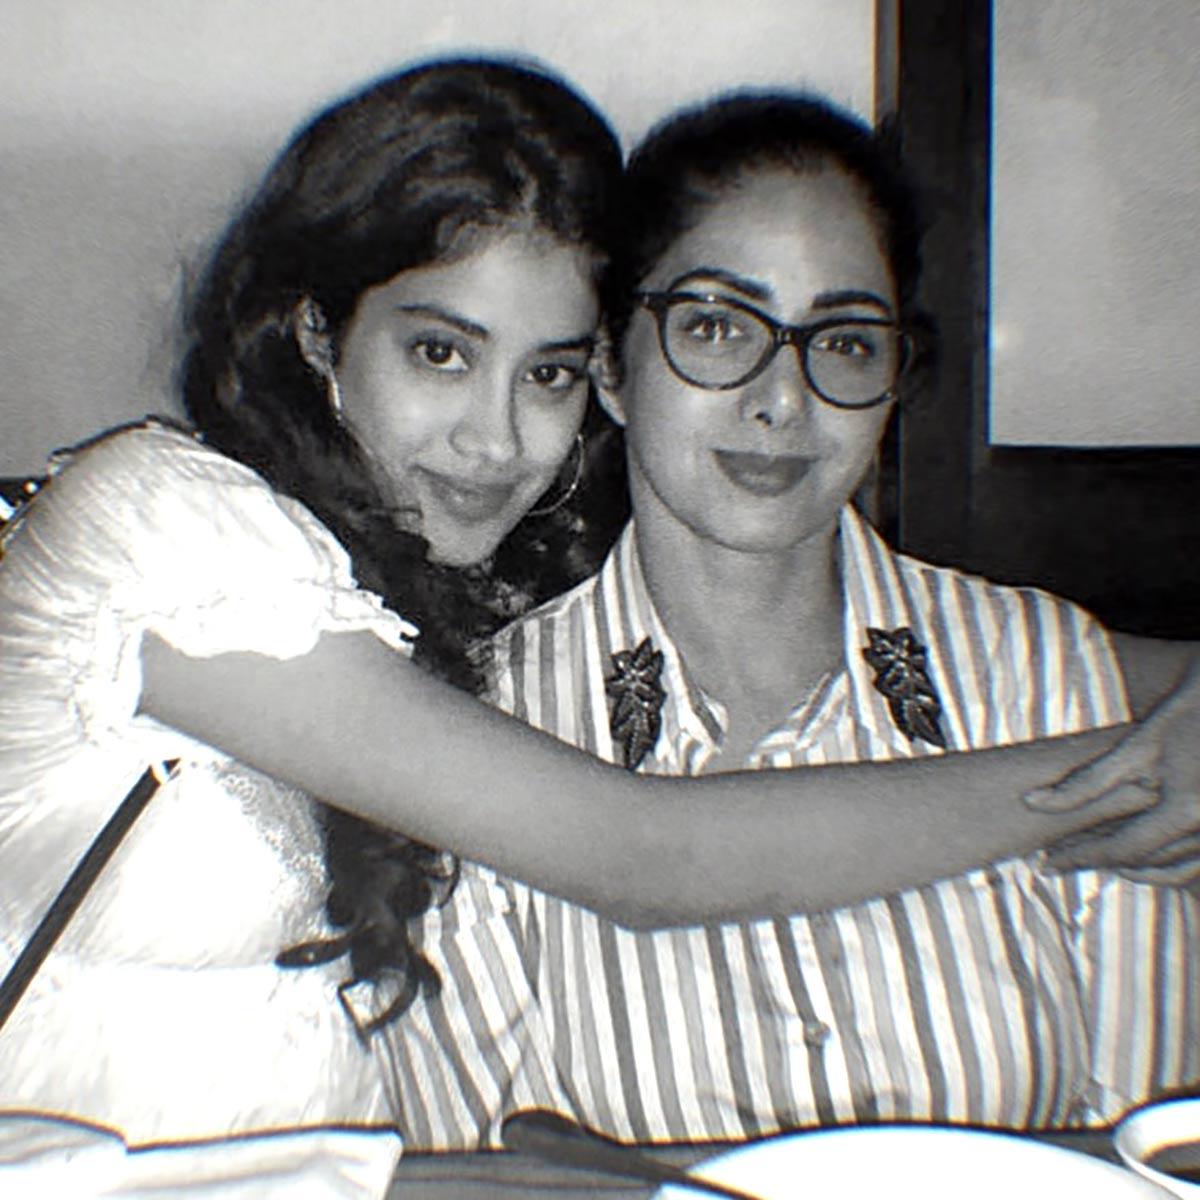 Janhvi on Sridevi: 'I love you mumma'